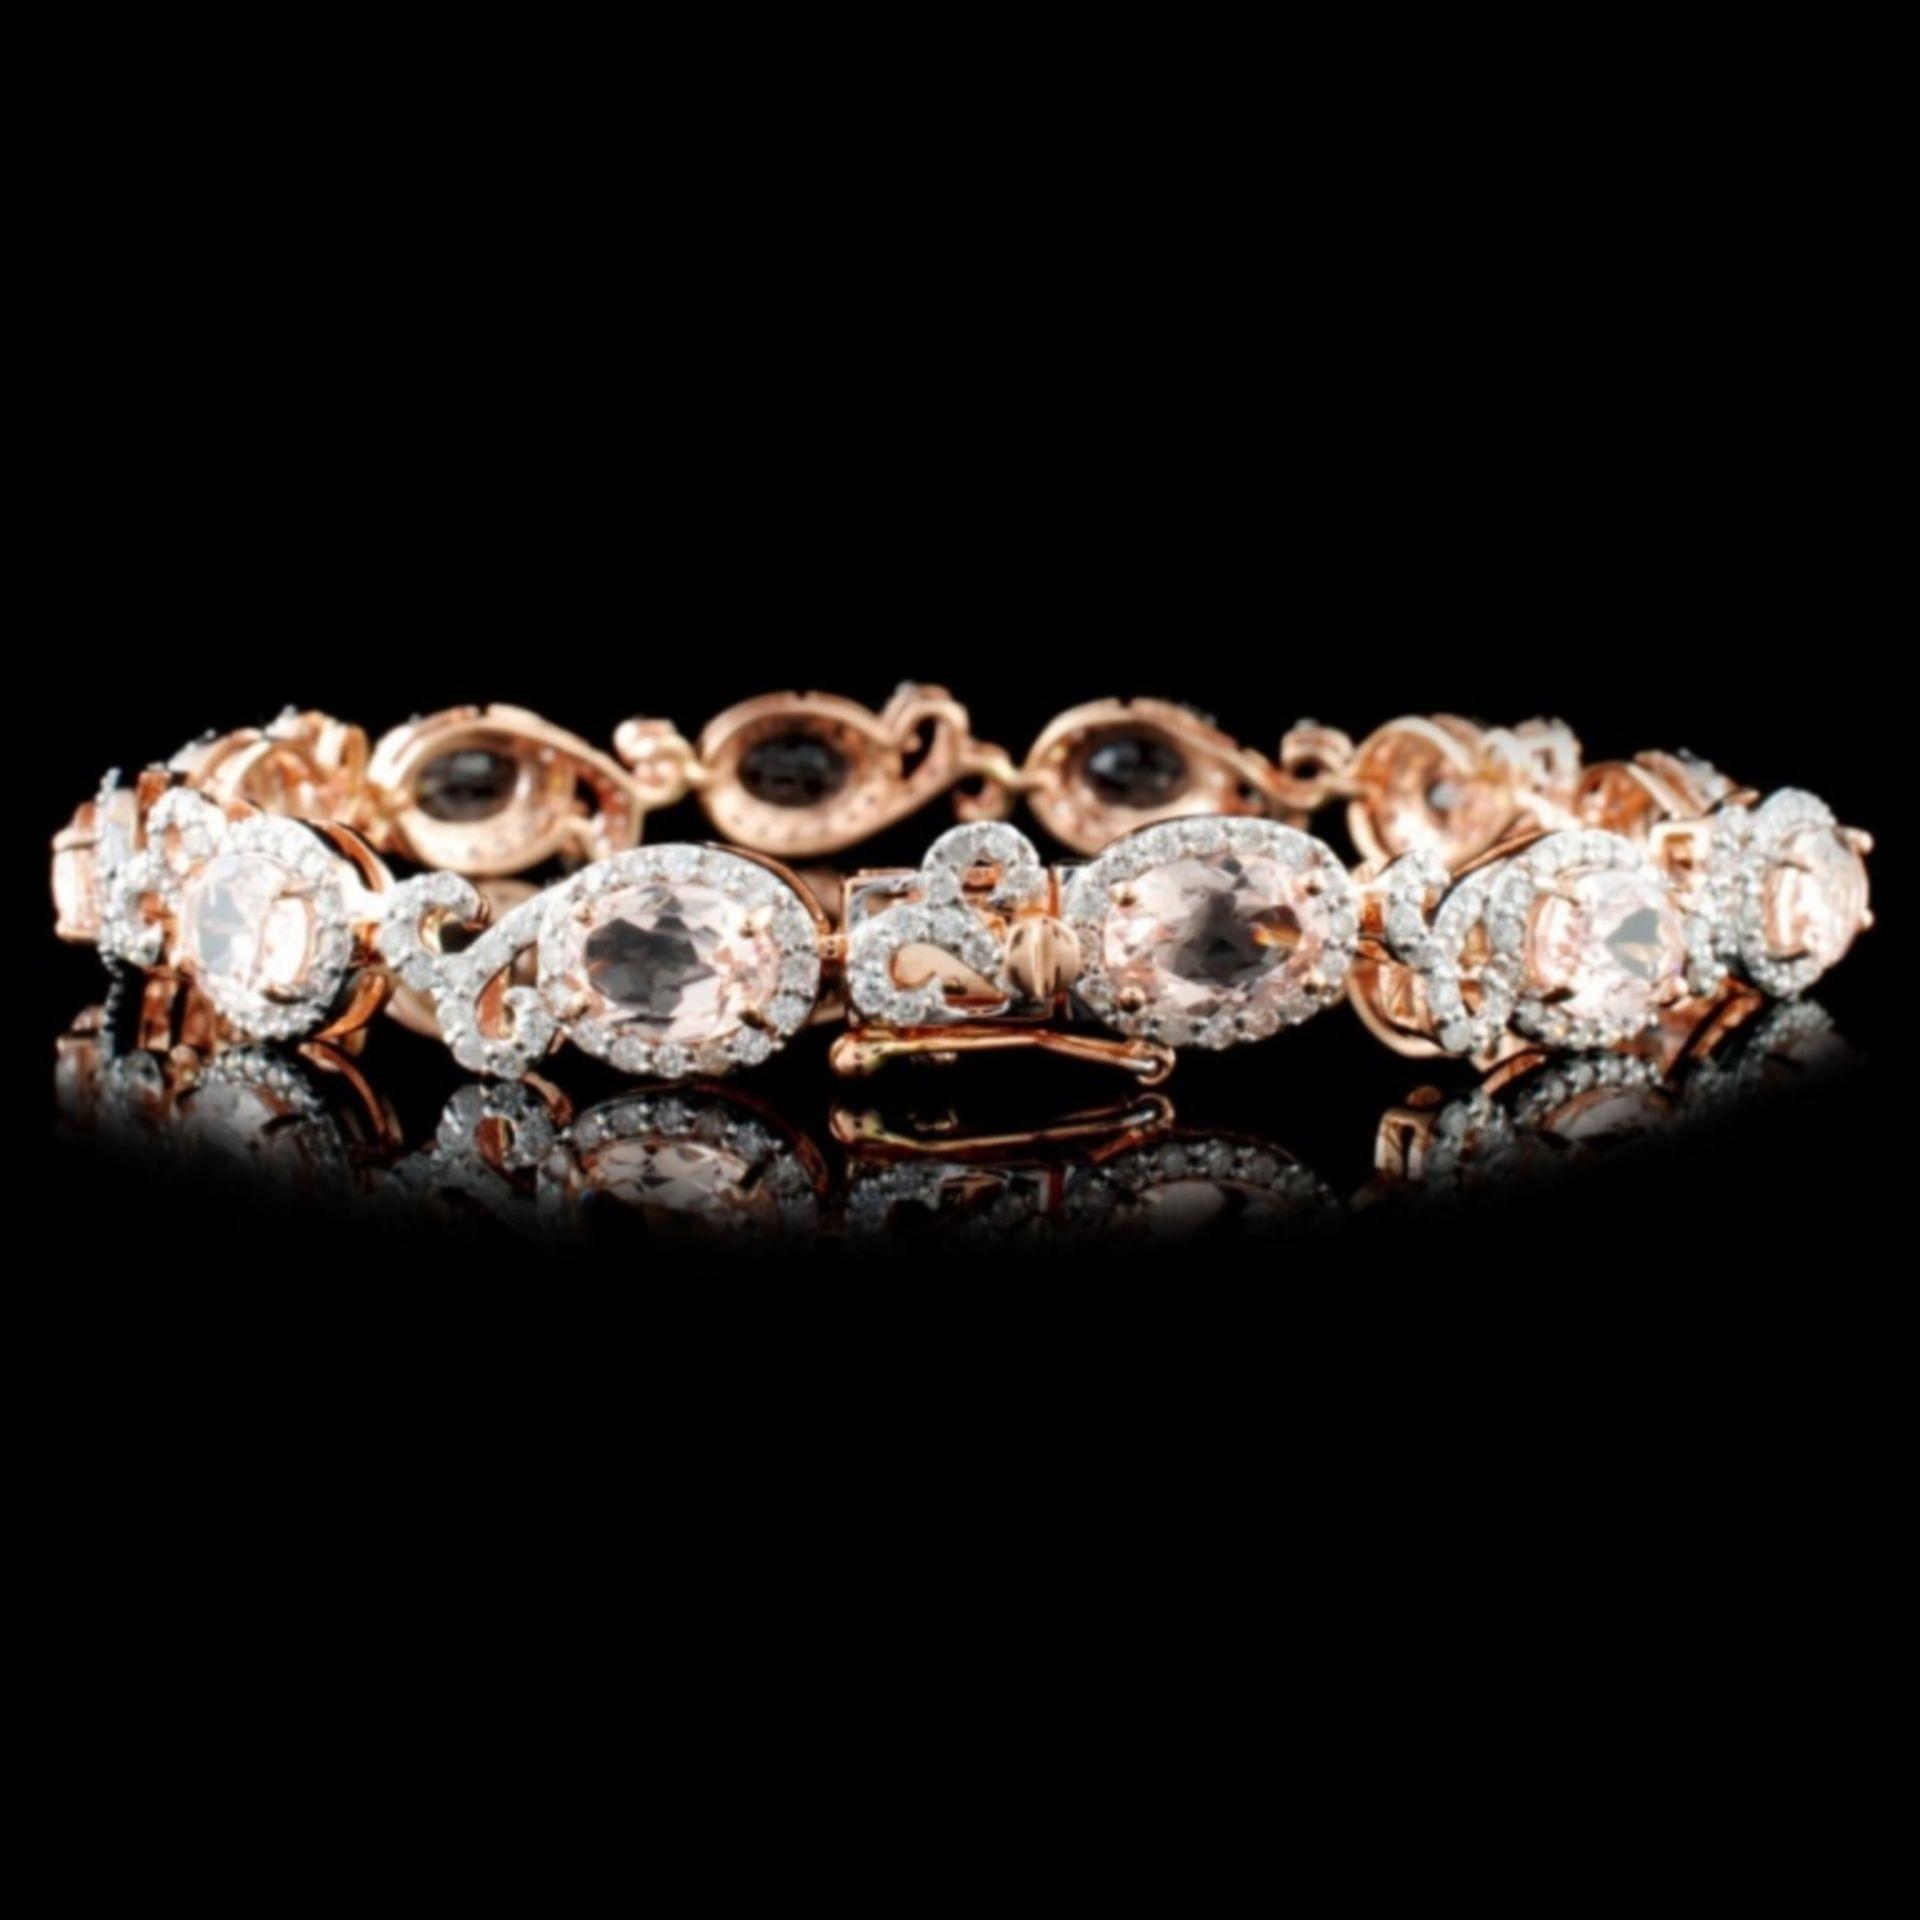 14K Gold 8.33ctw Morganite & 2.10ctw Diamond Brace - Image 2 of 3